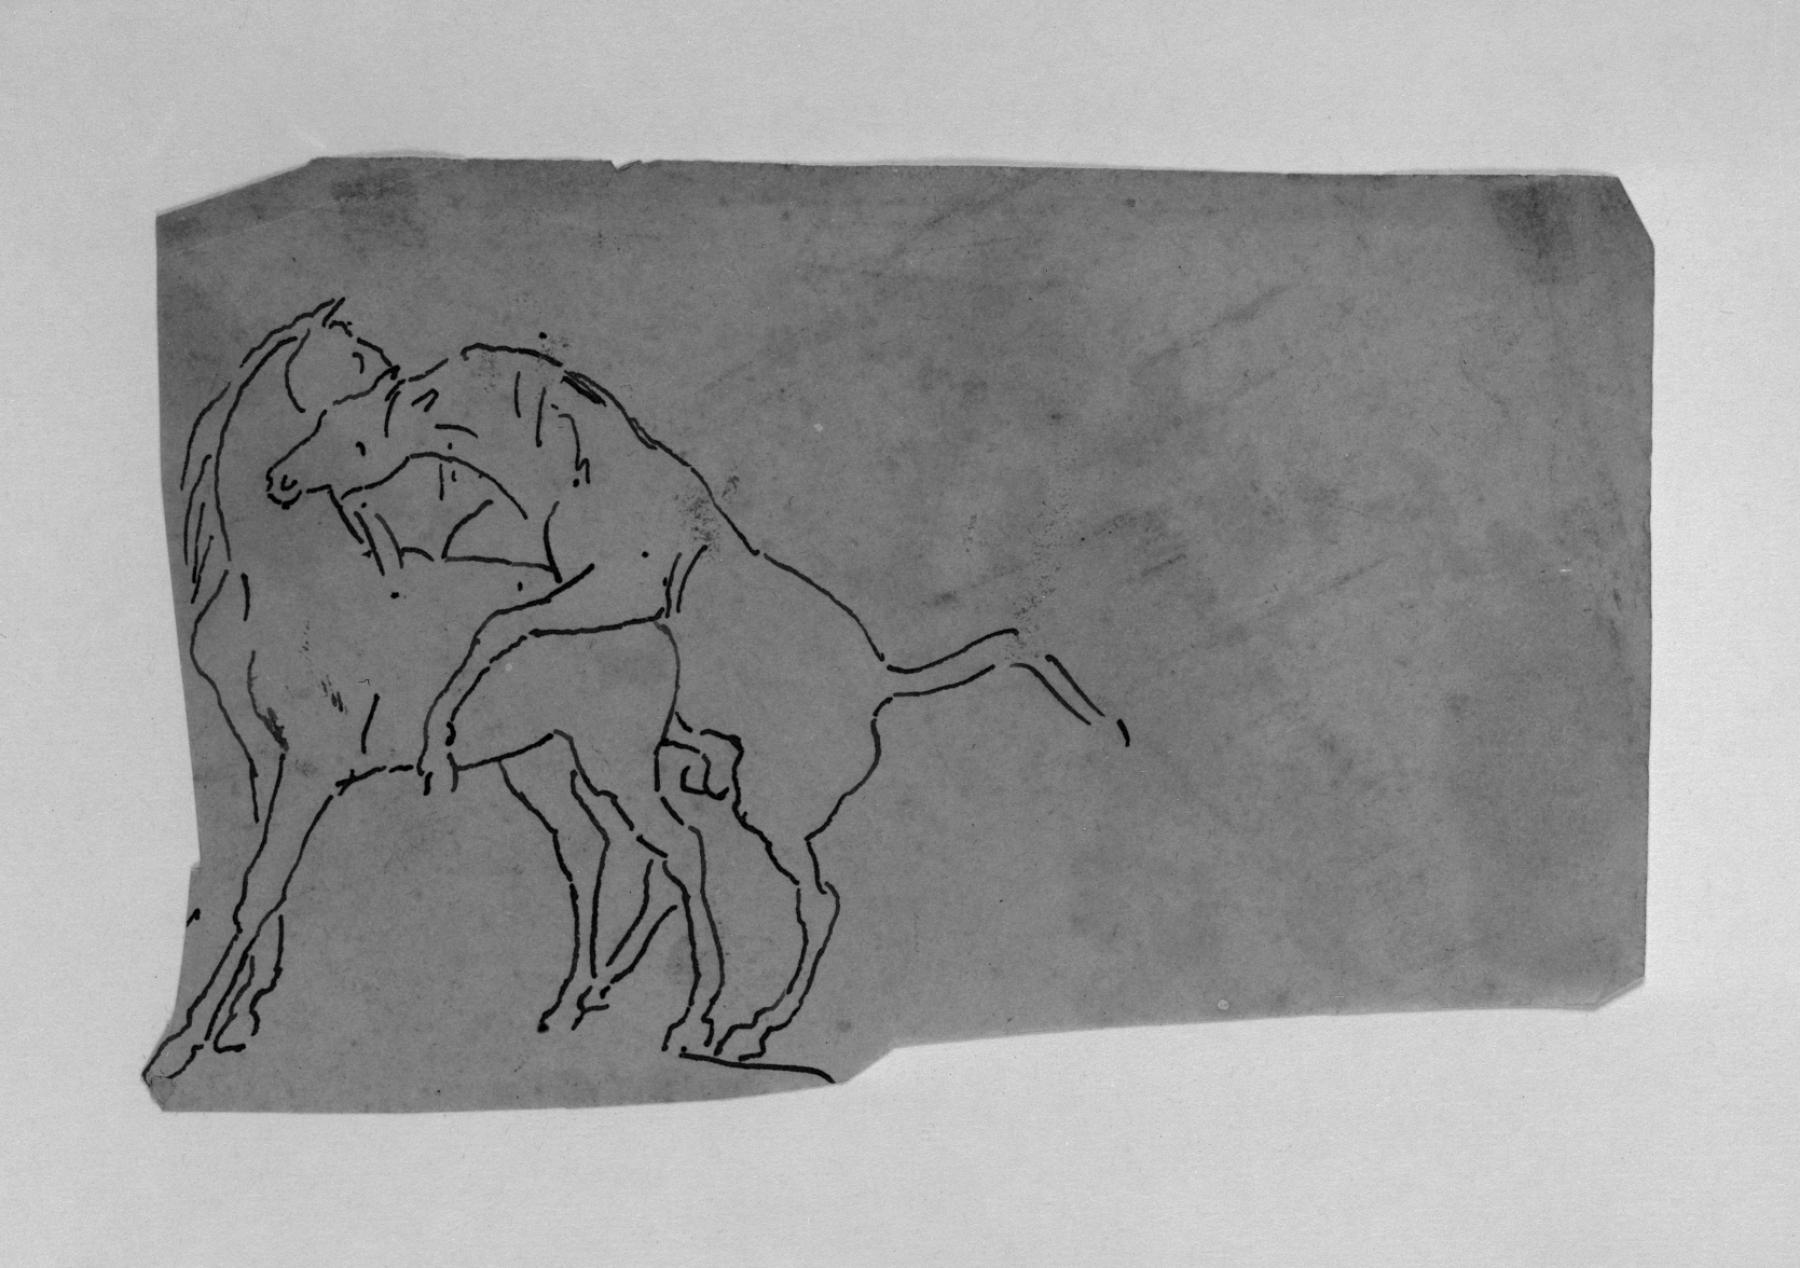 File:Antoine-Louis Barye - Tracing of a Sketch of Horses ...